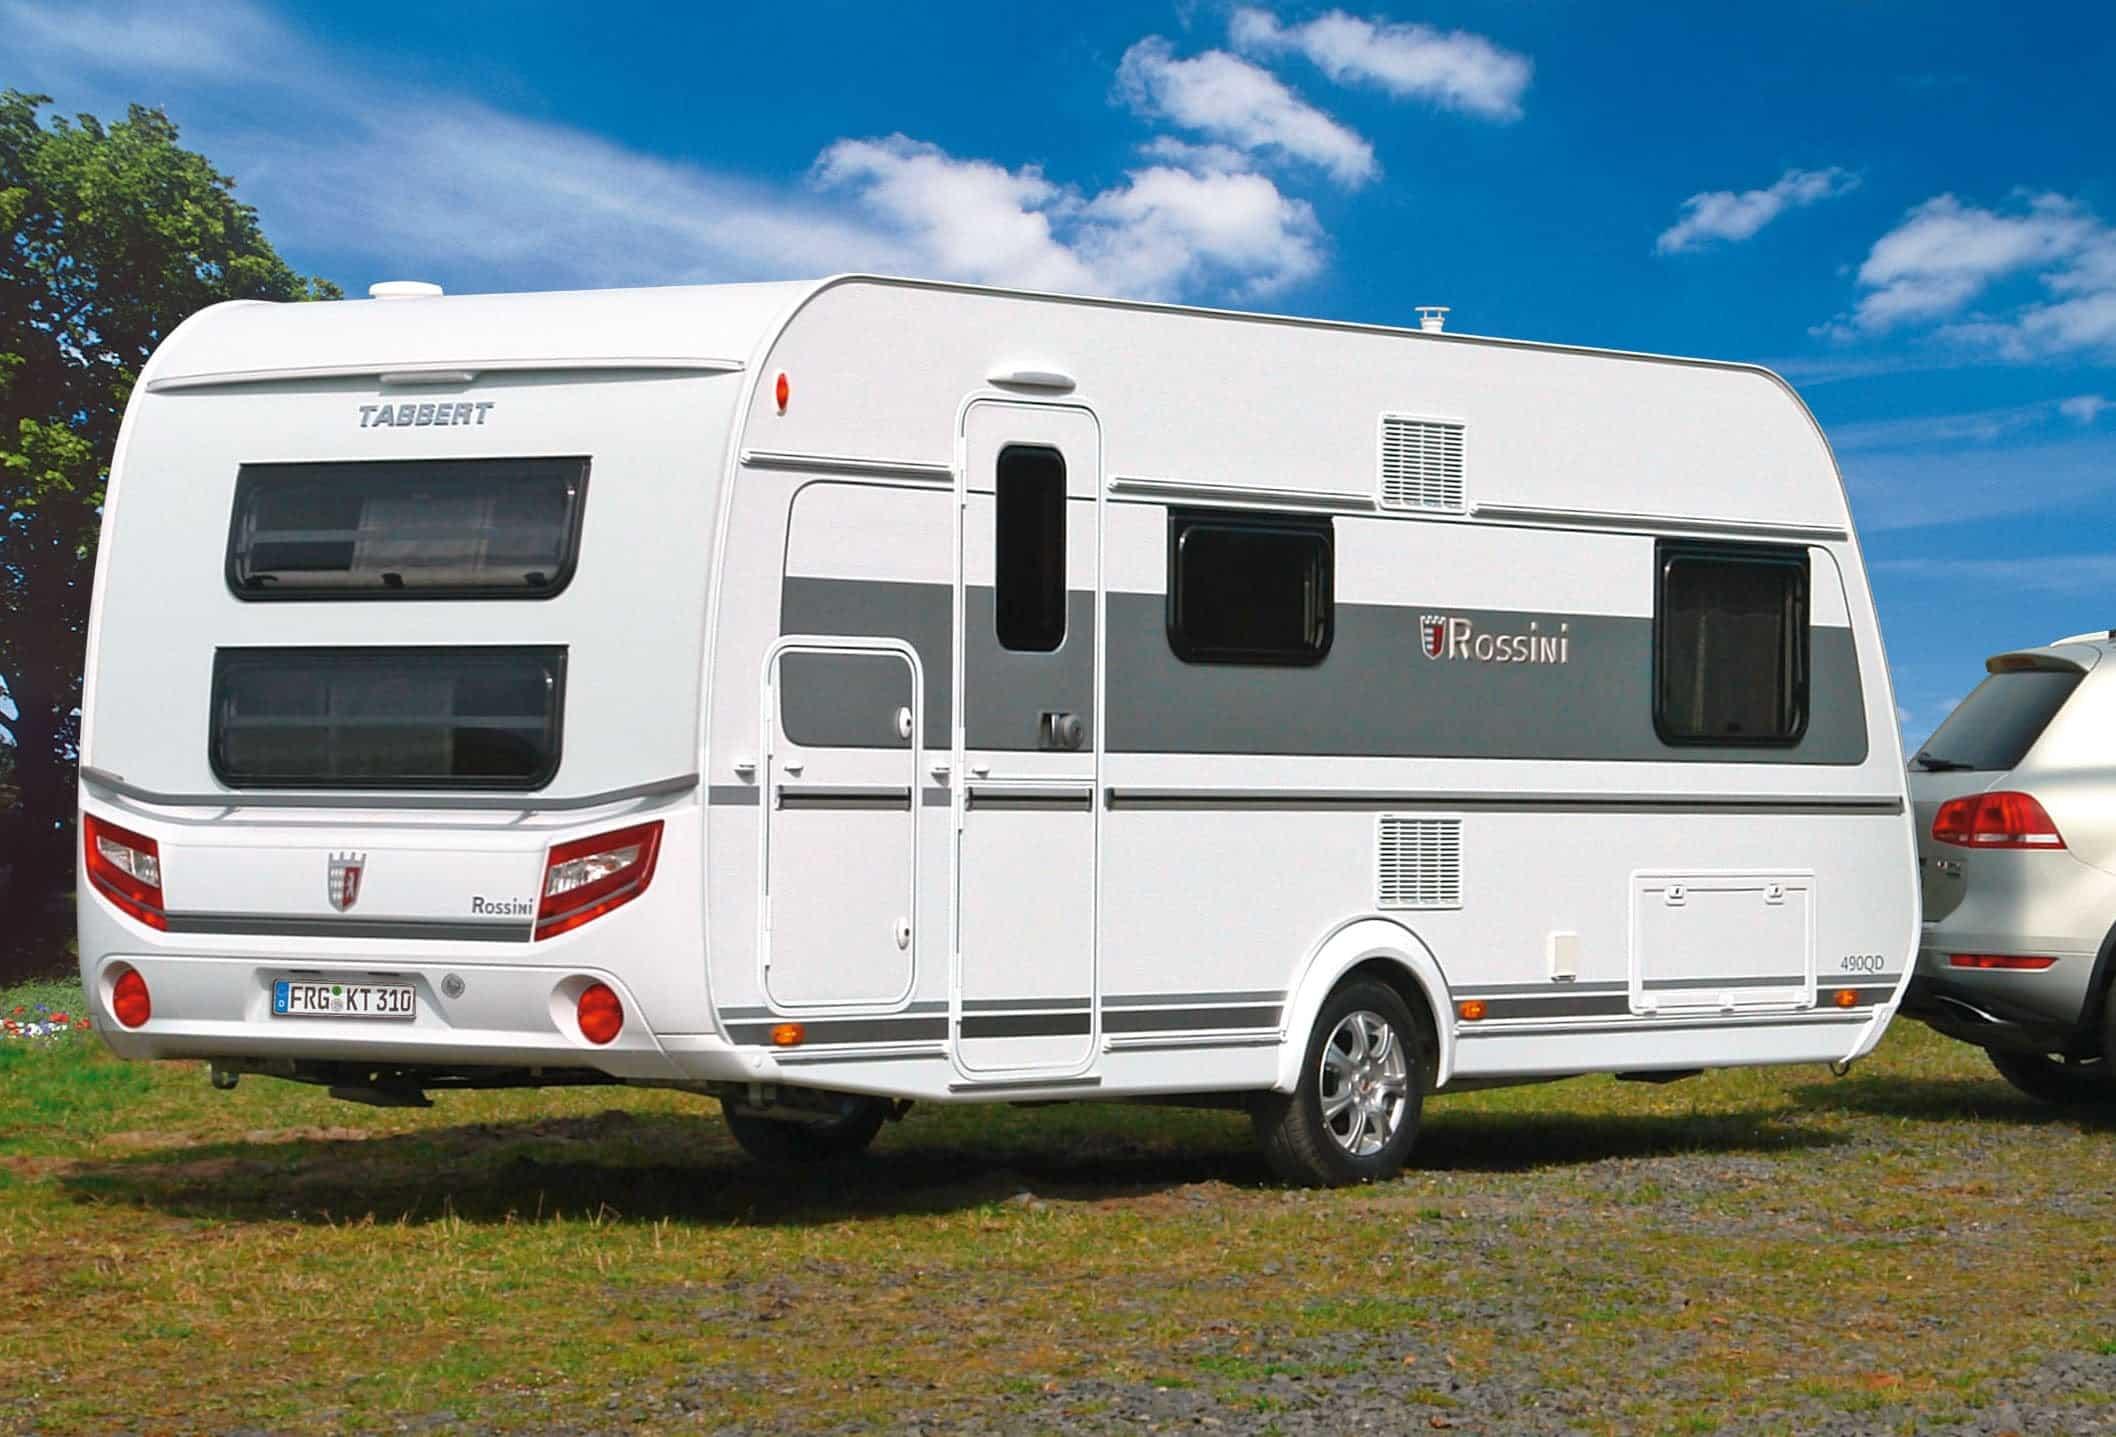 Wohnwagen Mit Etagenbett Test : Tabbert rossini 490 dm im test camping cars & caravans